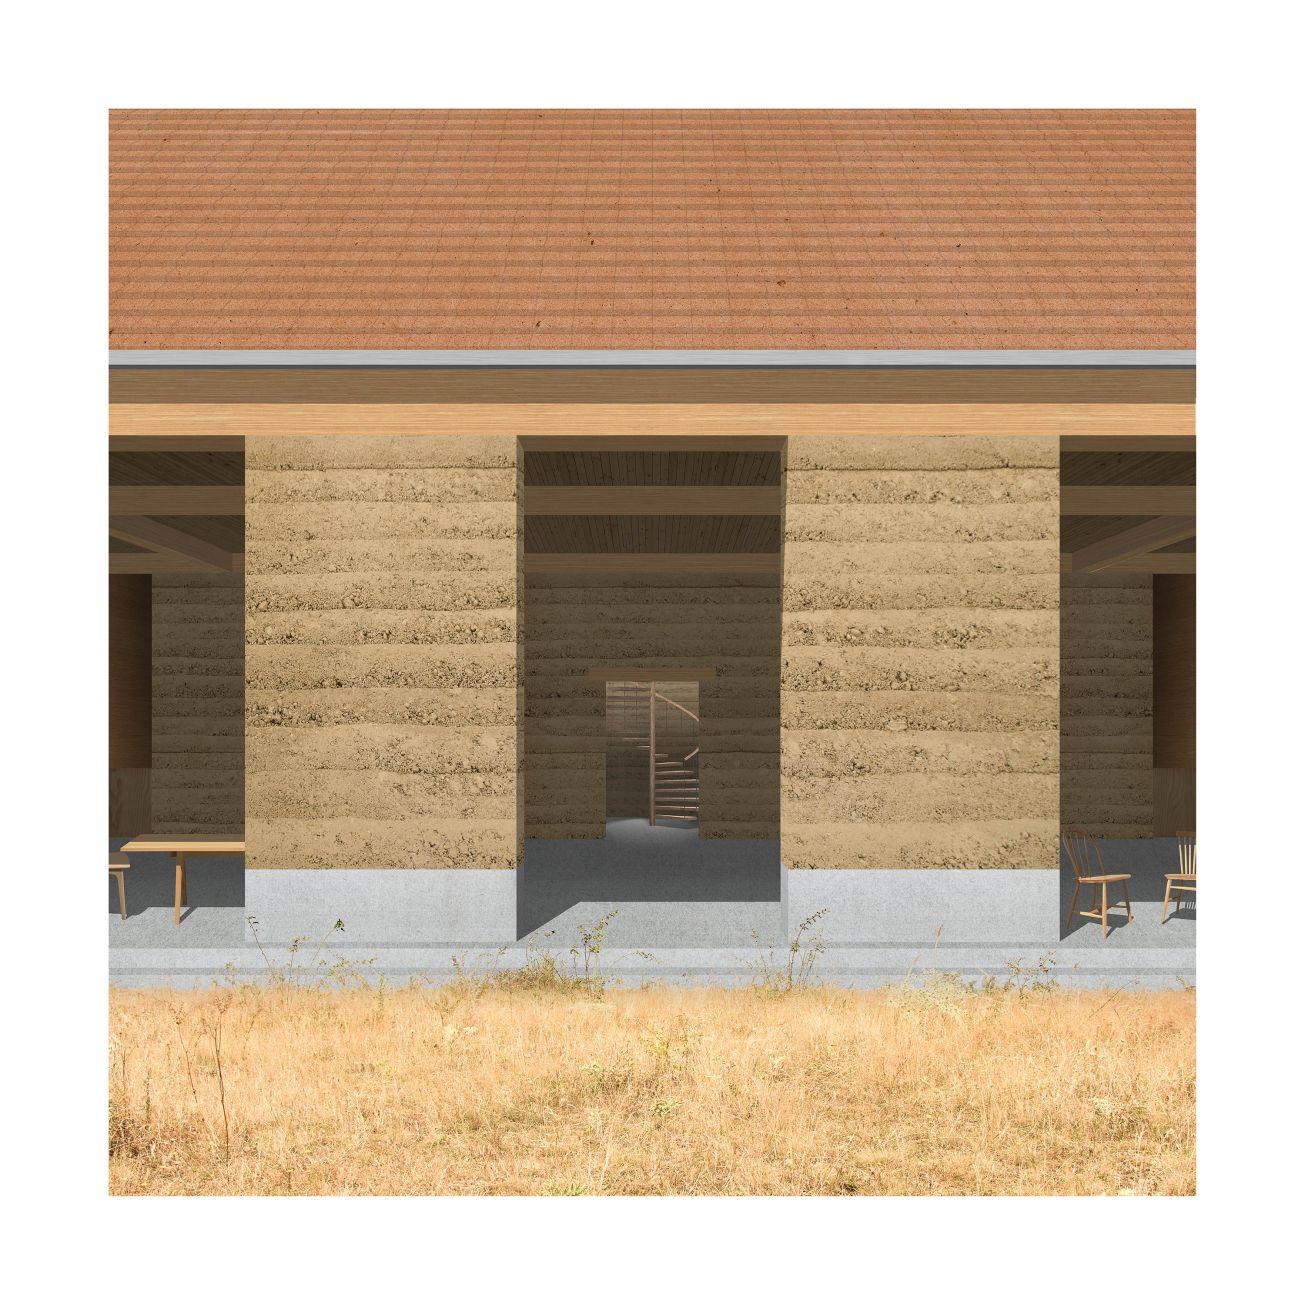 Villages 10 Interior View - New Settlement Facade